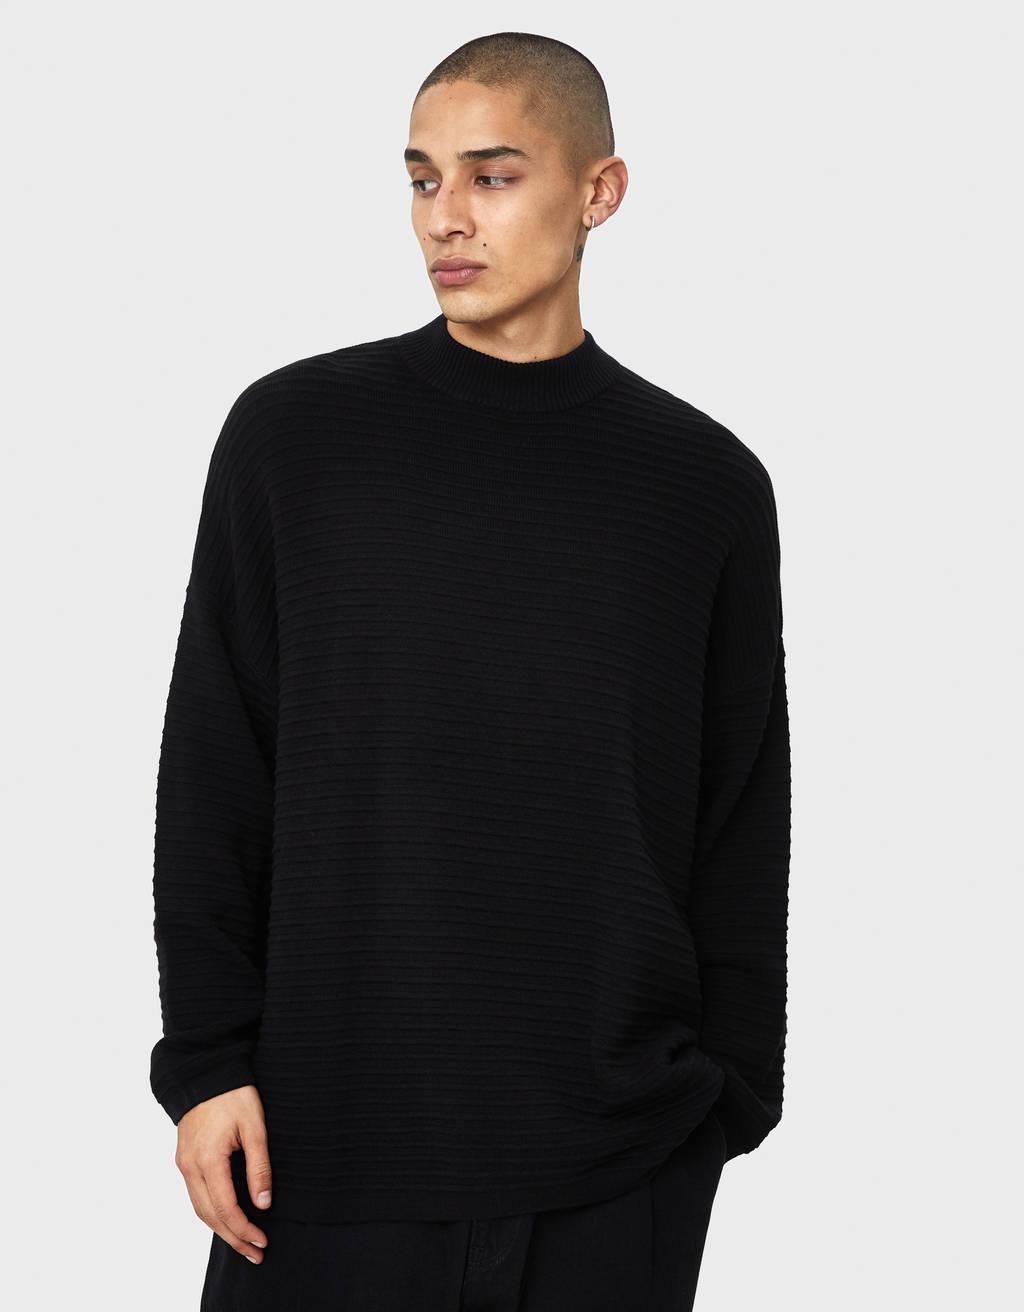 Sweater ottoman com gola perkins